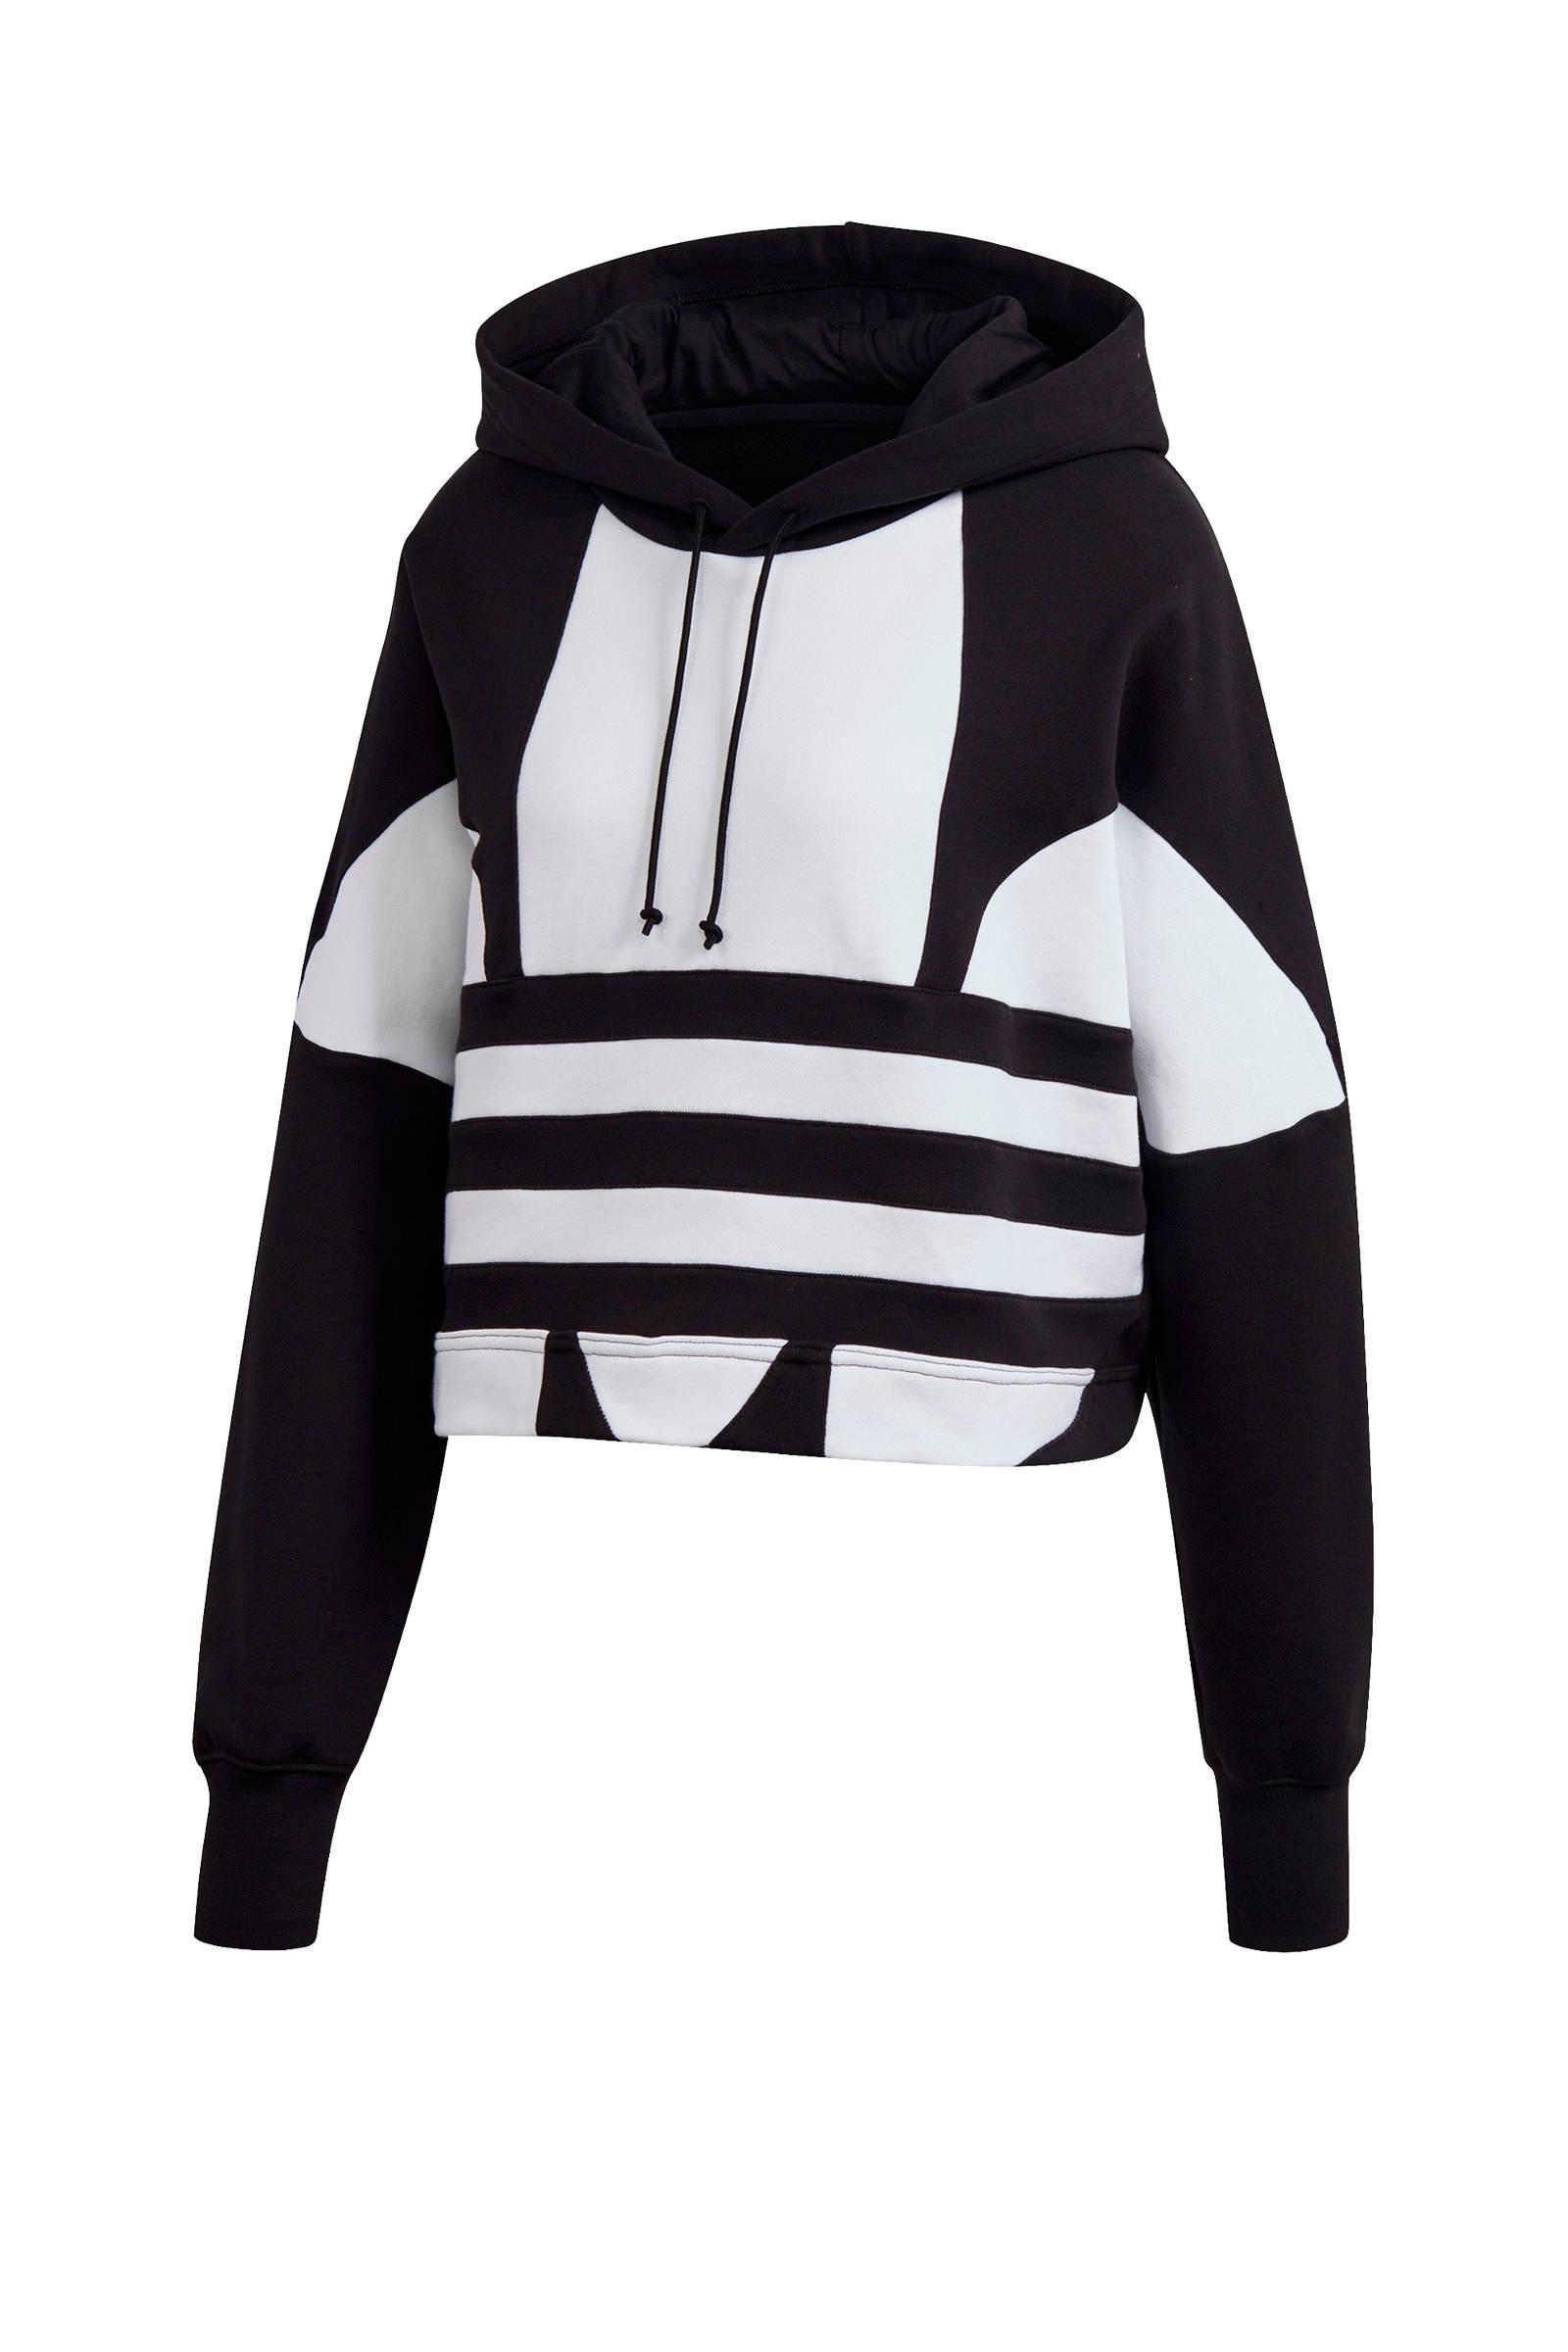 adidas Originals Adicolor cropped hoodie zwartwit   wehkamp